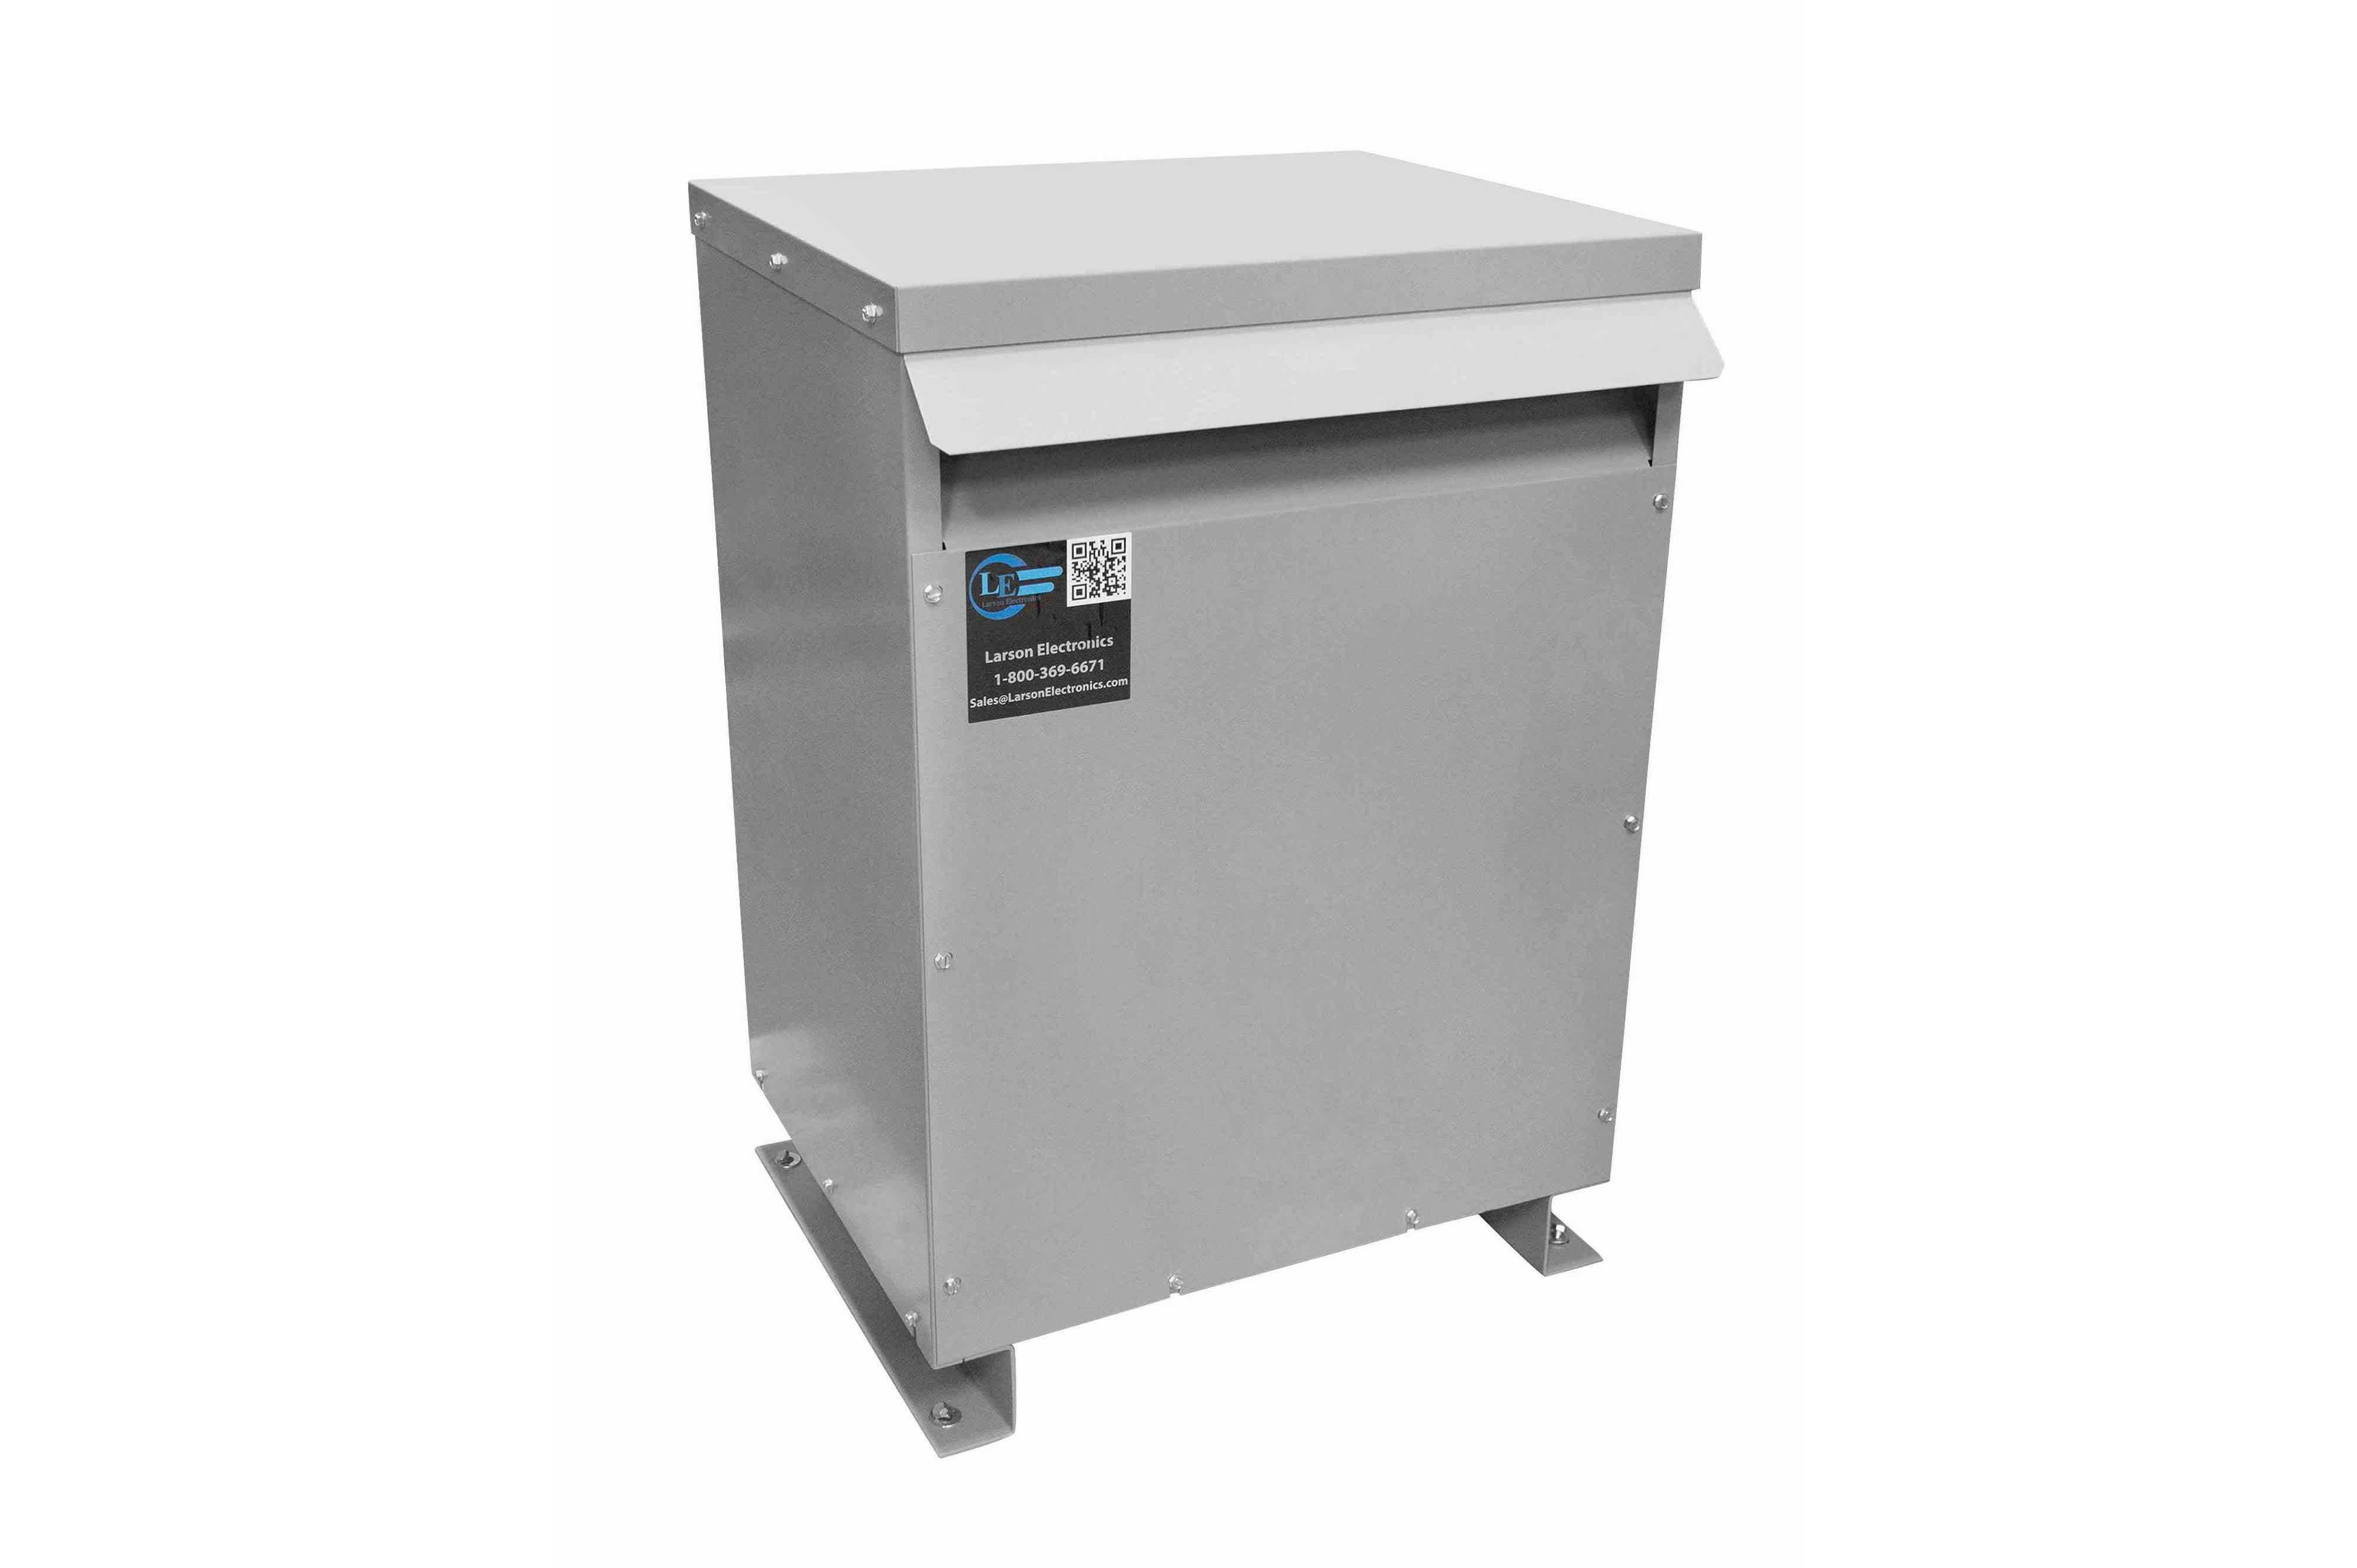 60 kVA 3PH Isolation Transformer, 208V Wye Primary, 240V/120 Delta Secondary, N3R, Ventilated, 60 Hz